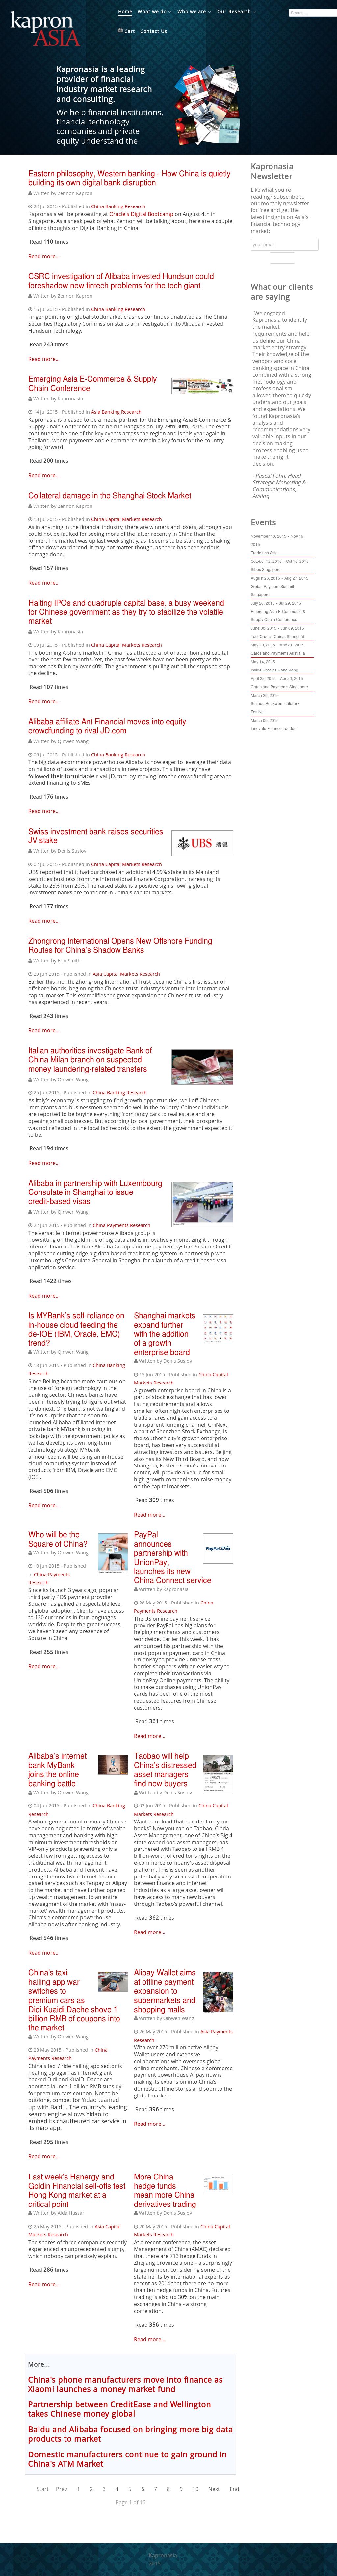 Kapronasia Competitors, Revenue and Employees - Owler